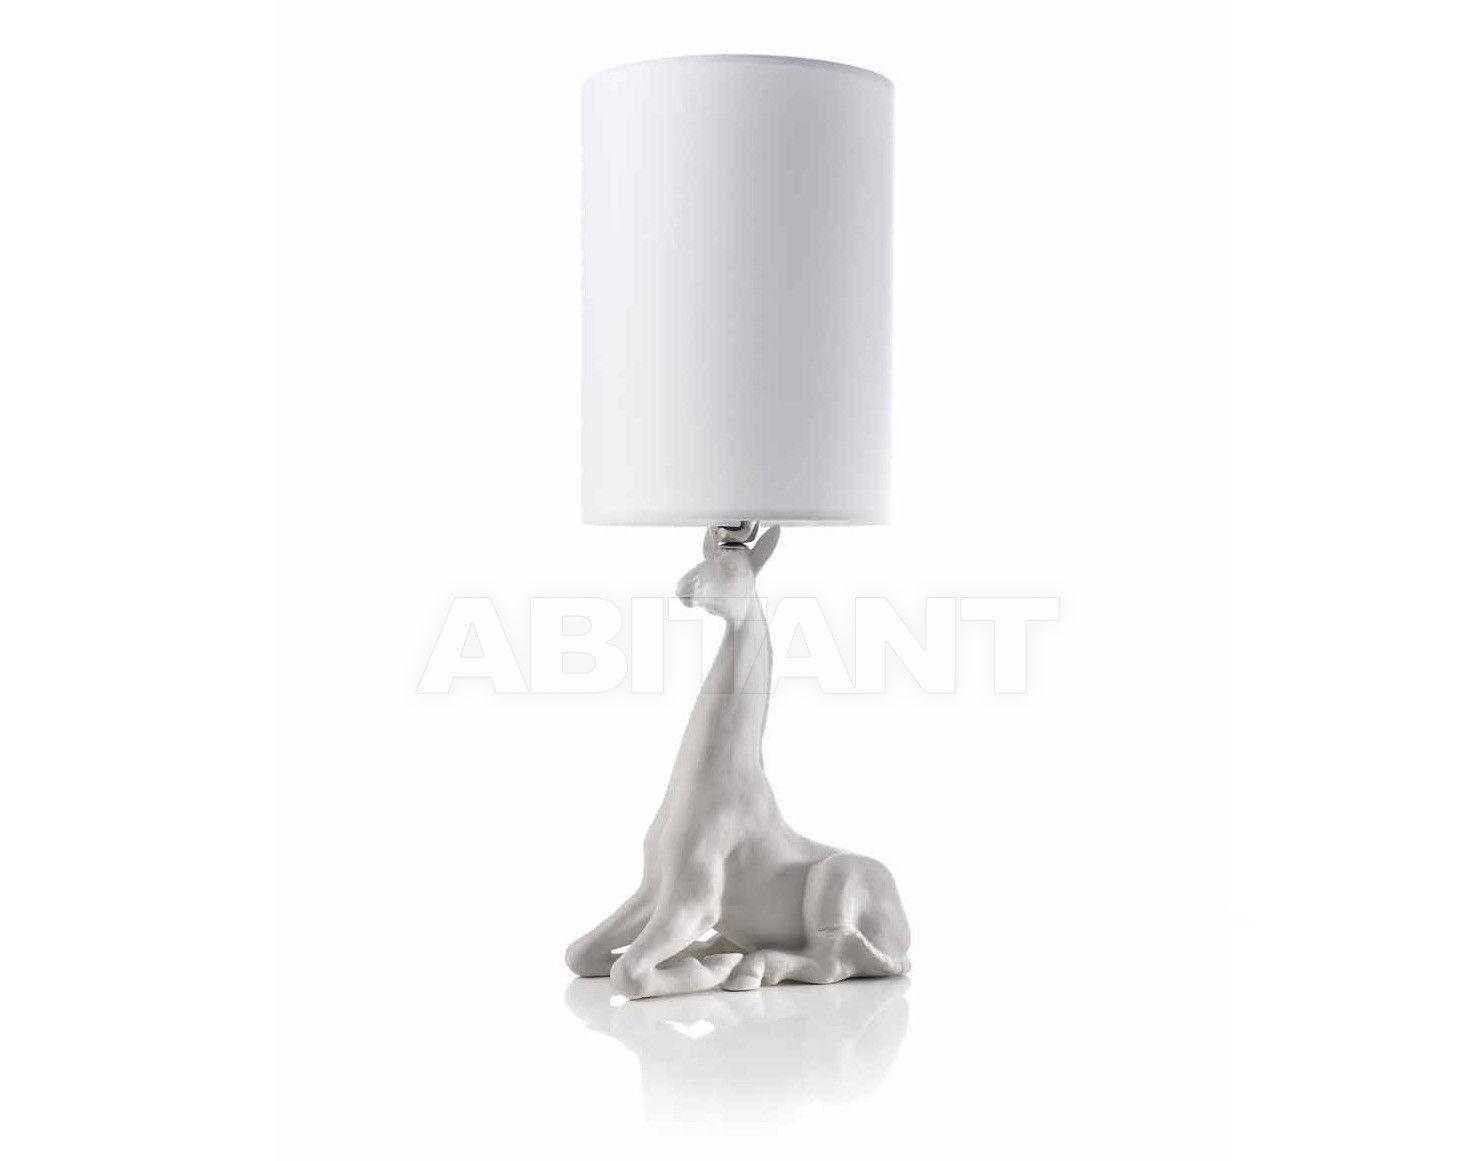 Купить Лампа настольная SMALL GIRAFFE LAMP Villari Grande Opera Ii 0003715-101